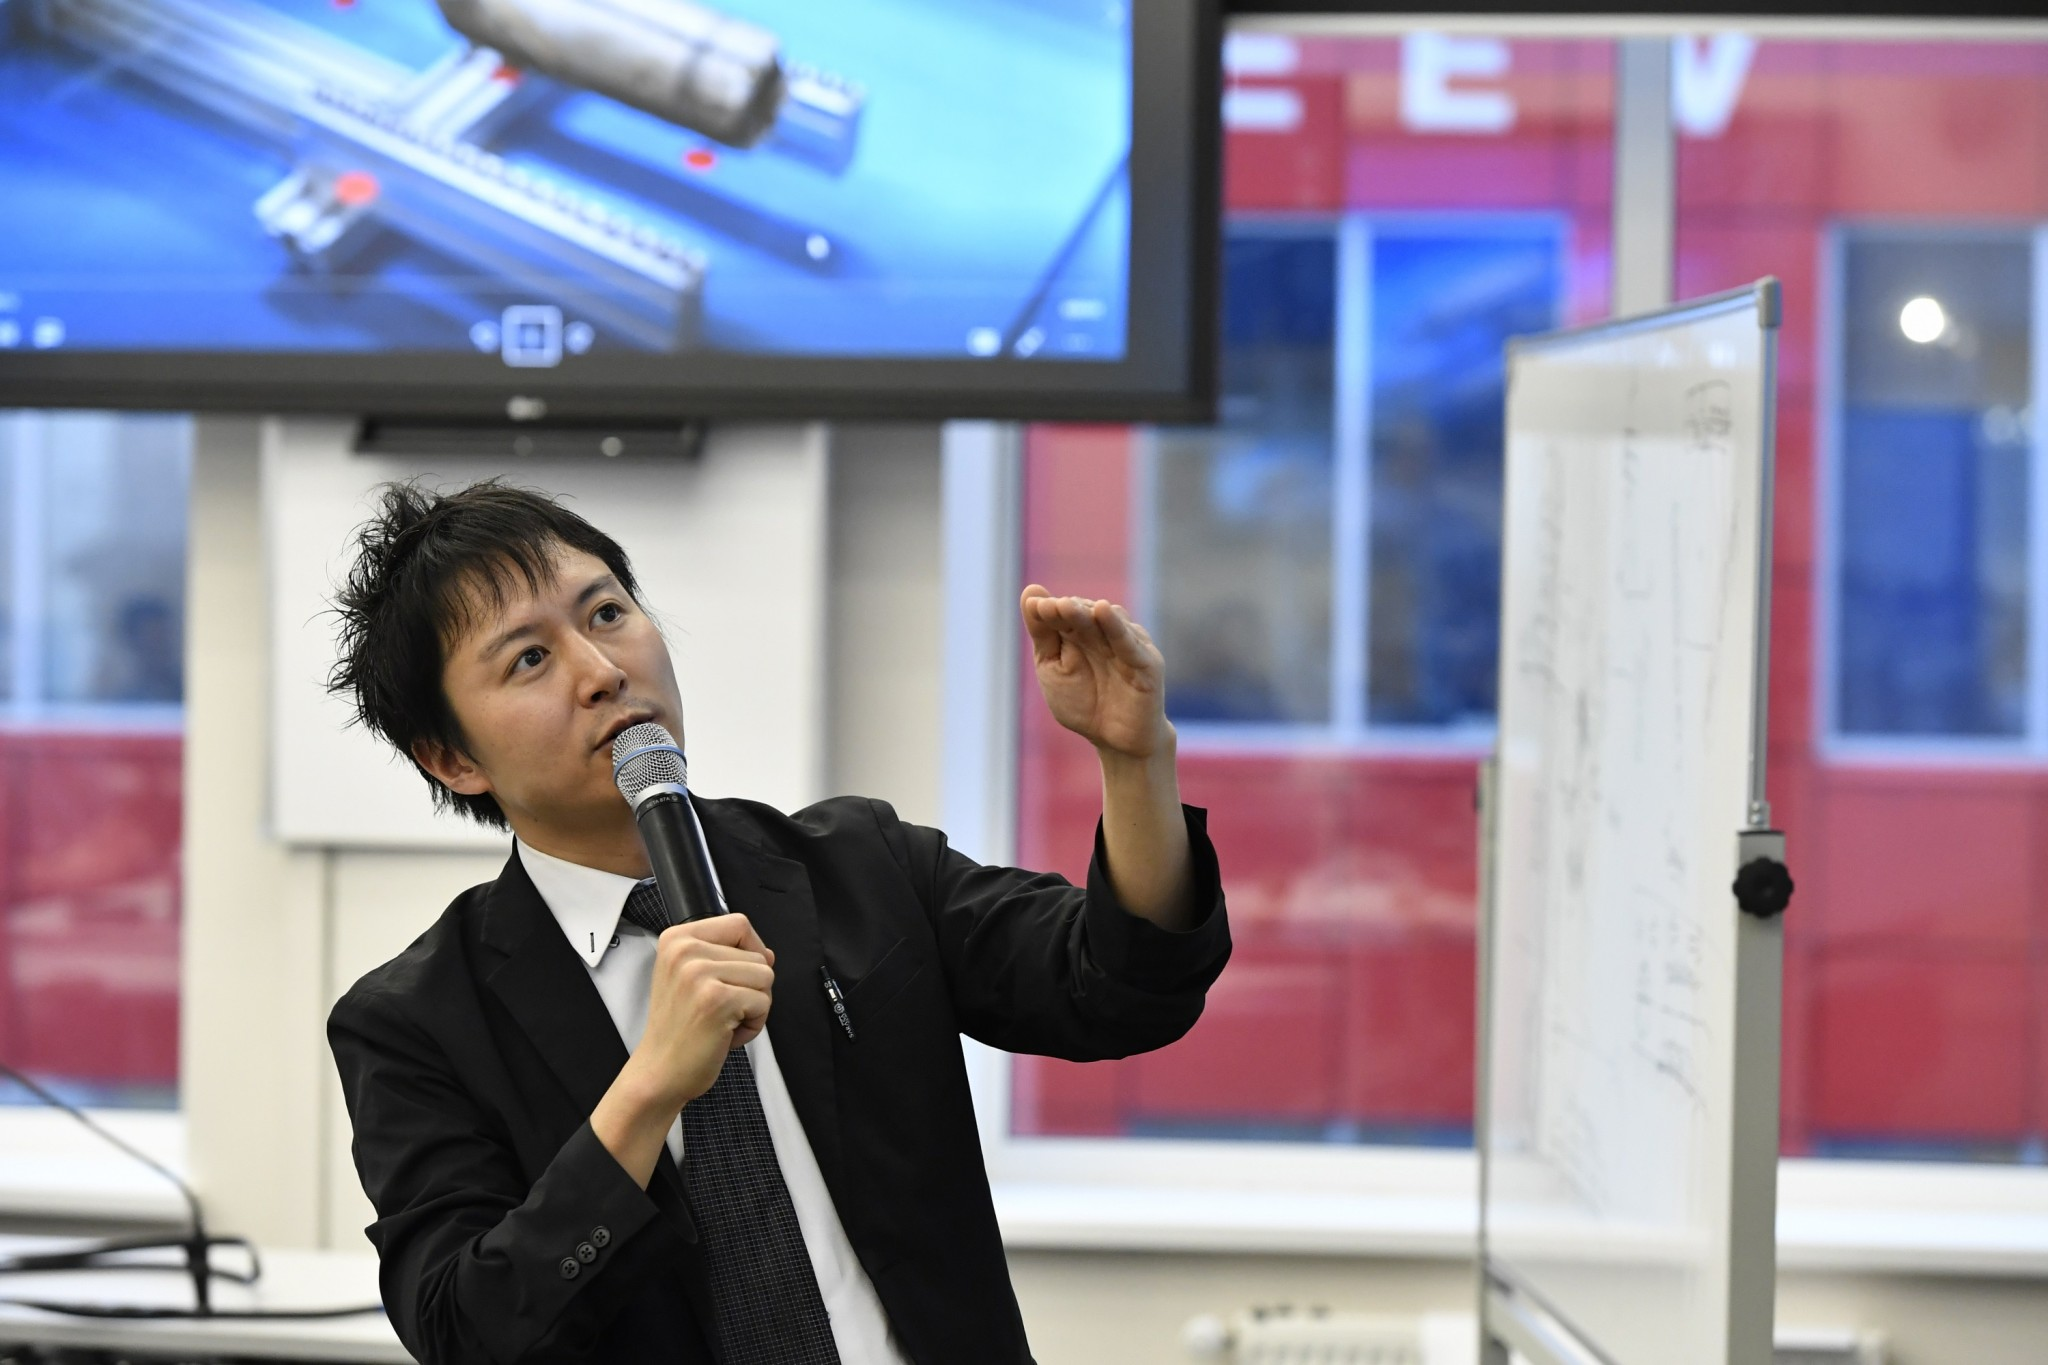 Professor Kenjiro Tadakuma of Tohoku University in Japan delivers a guest lecture at Skoltech. Photo: Skoltech.